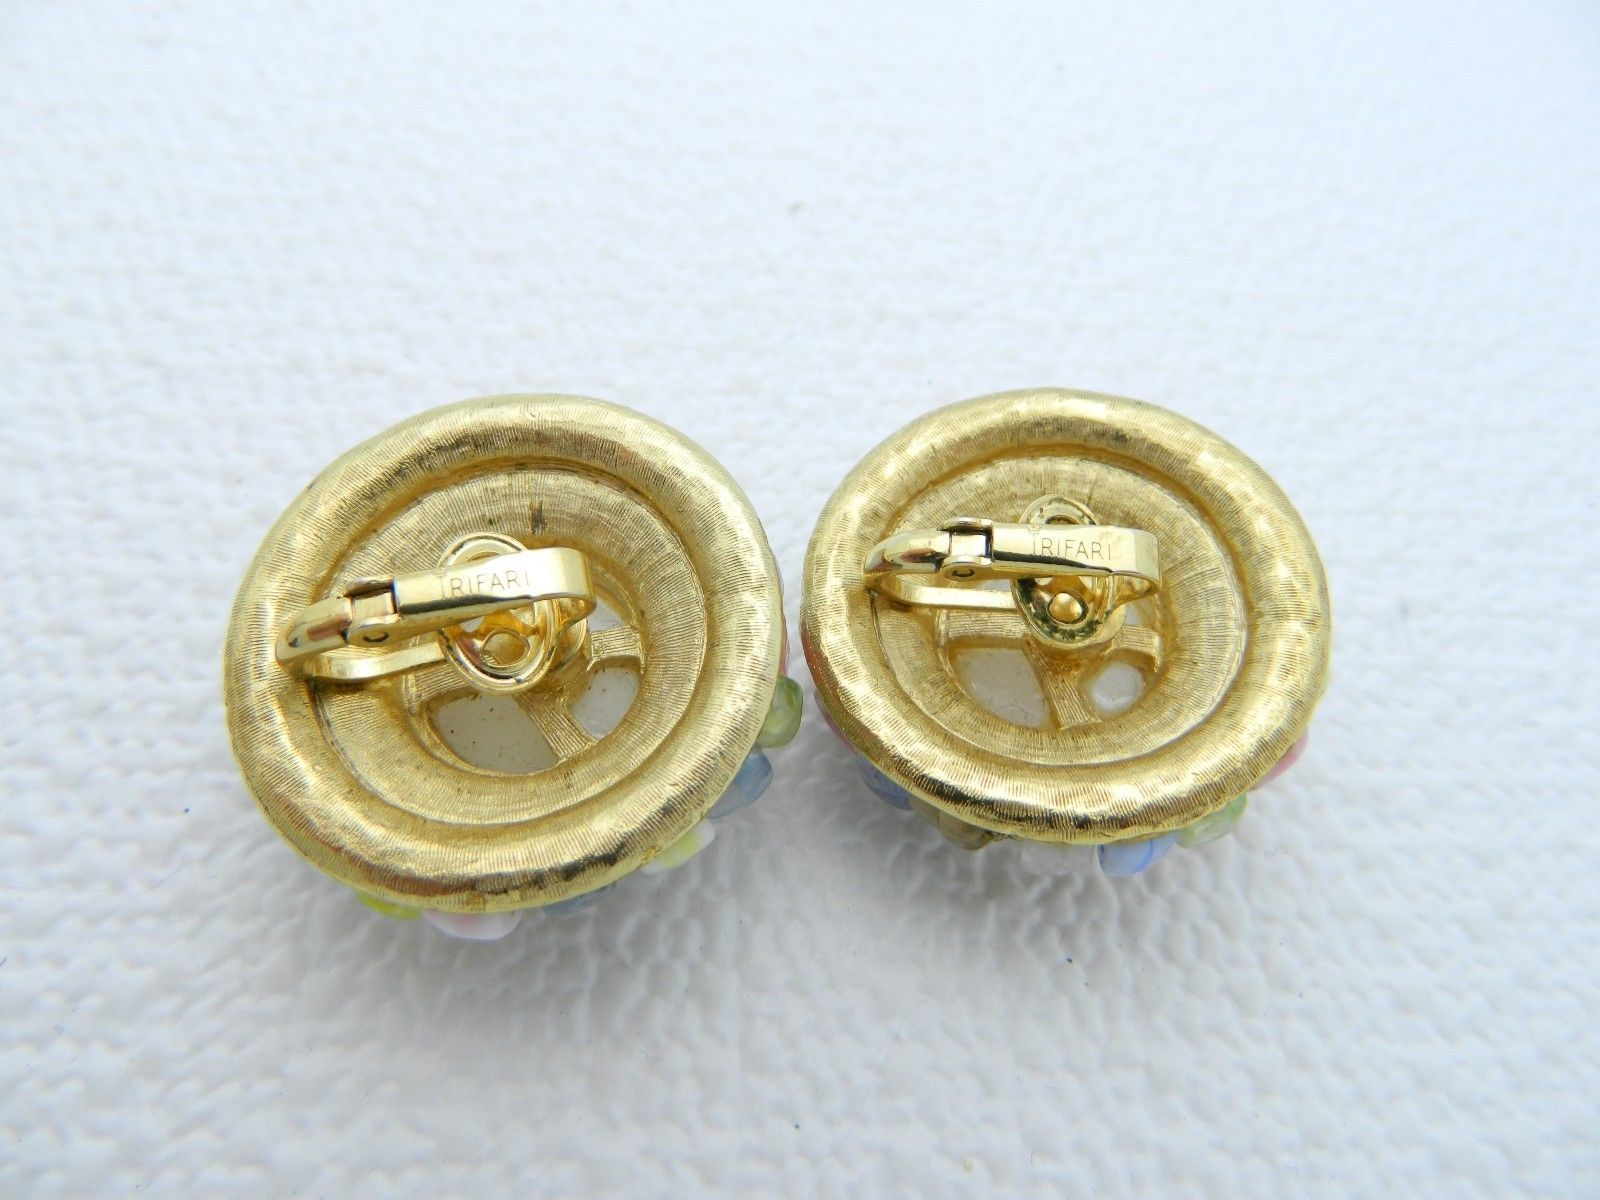 VTG CROWN TRIFARI Sign Gold Tone Multi Color Beaded Art Glass Clip Earrings